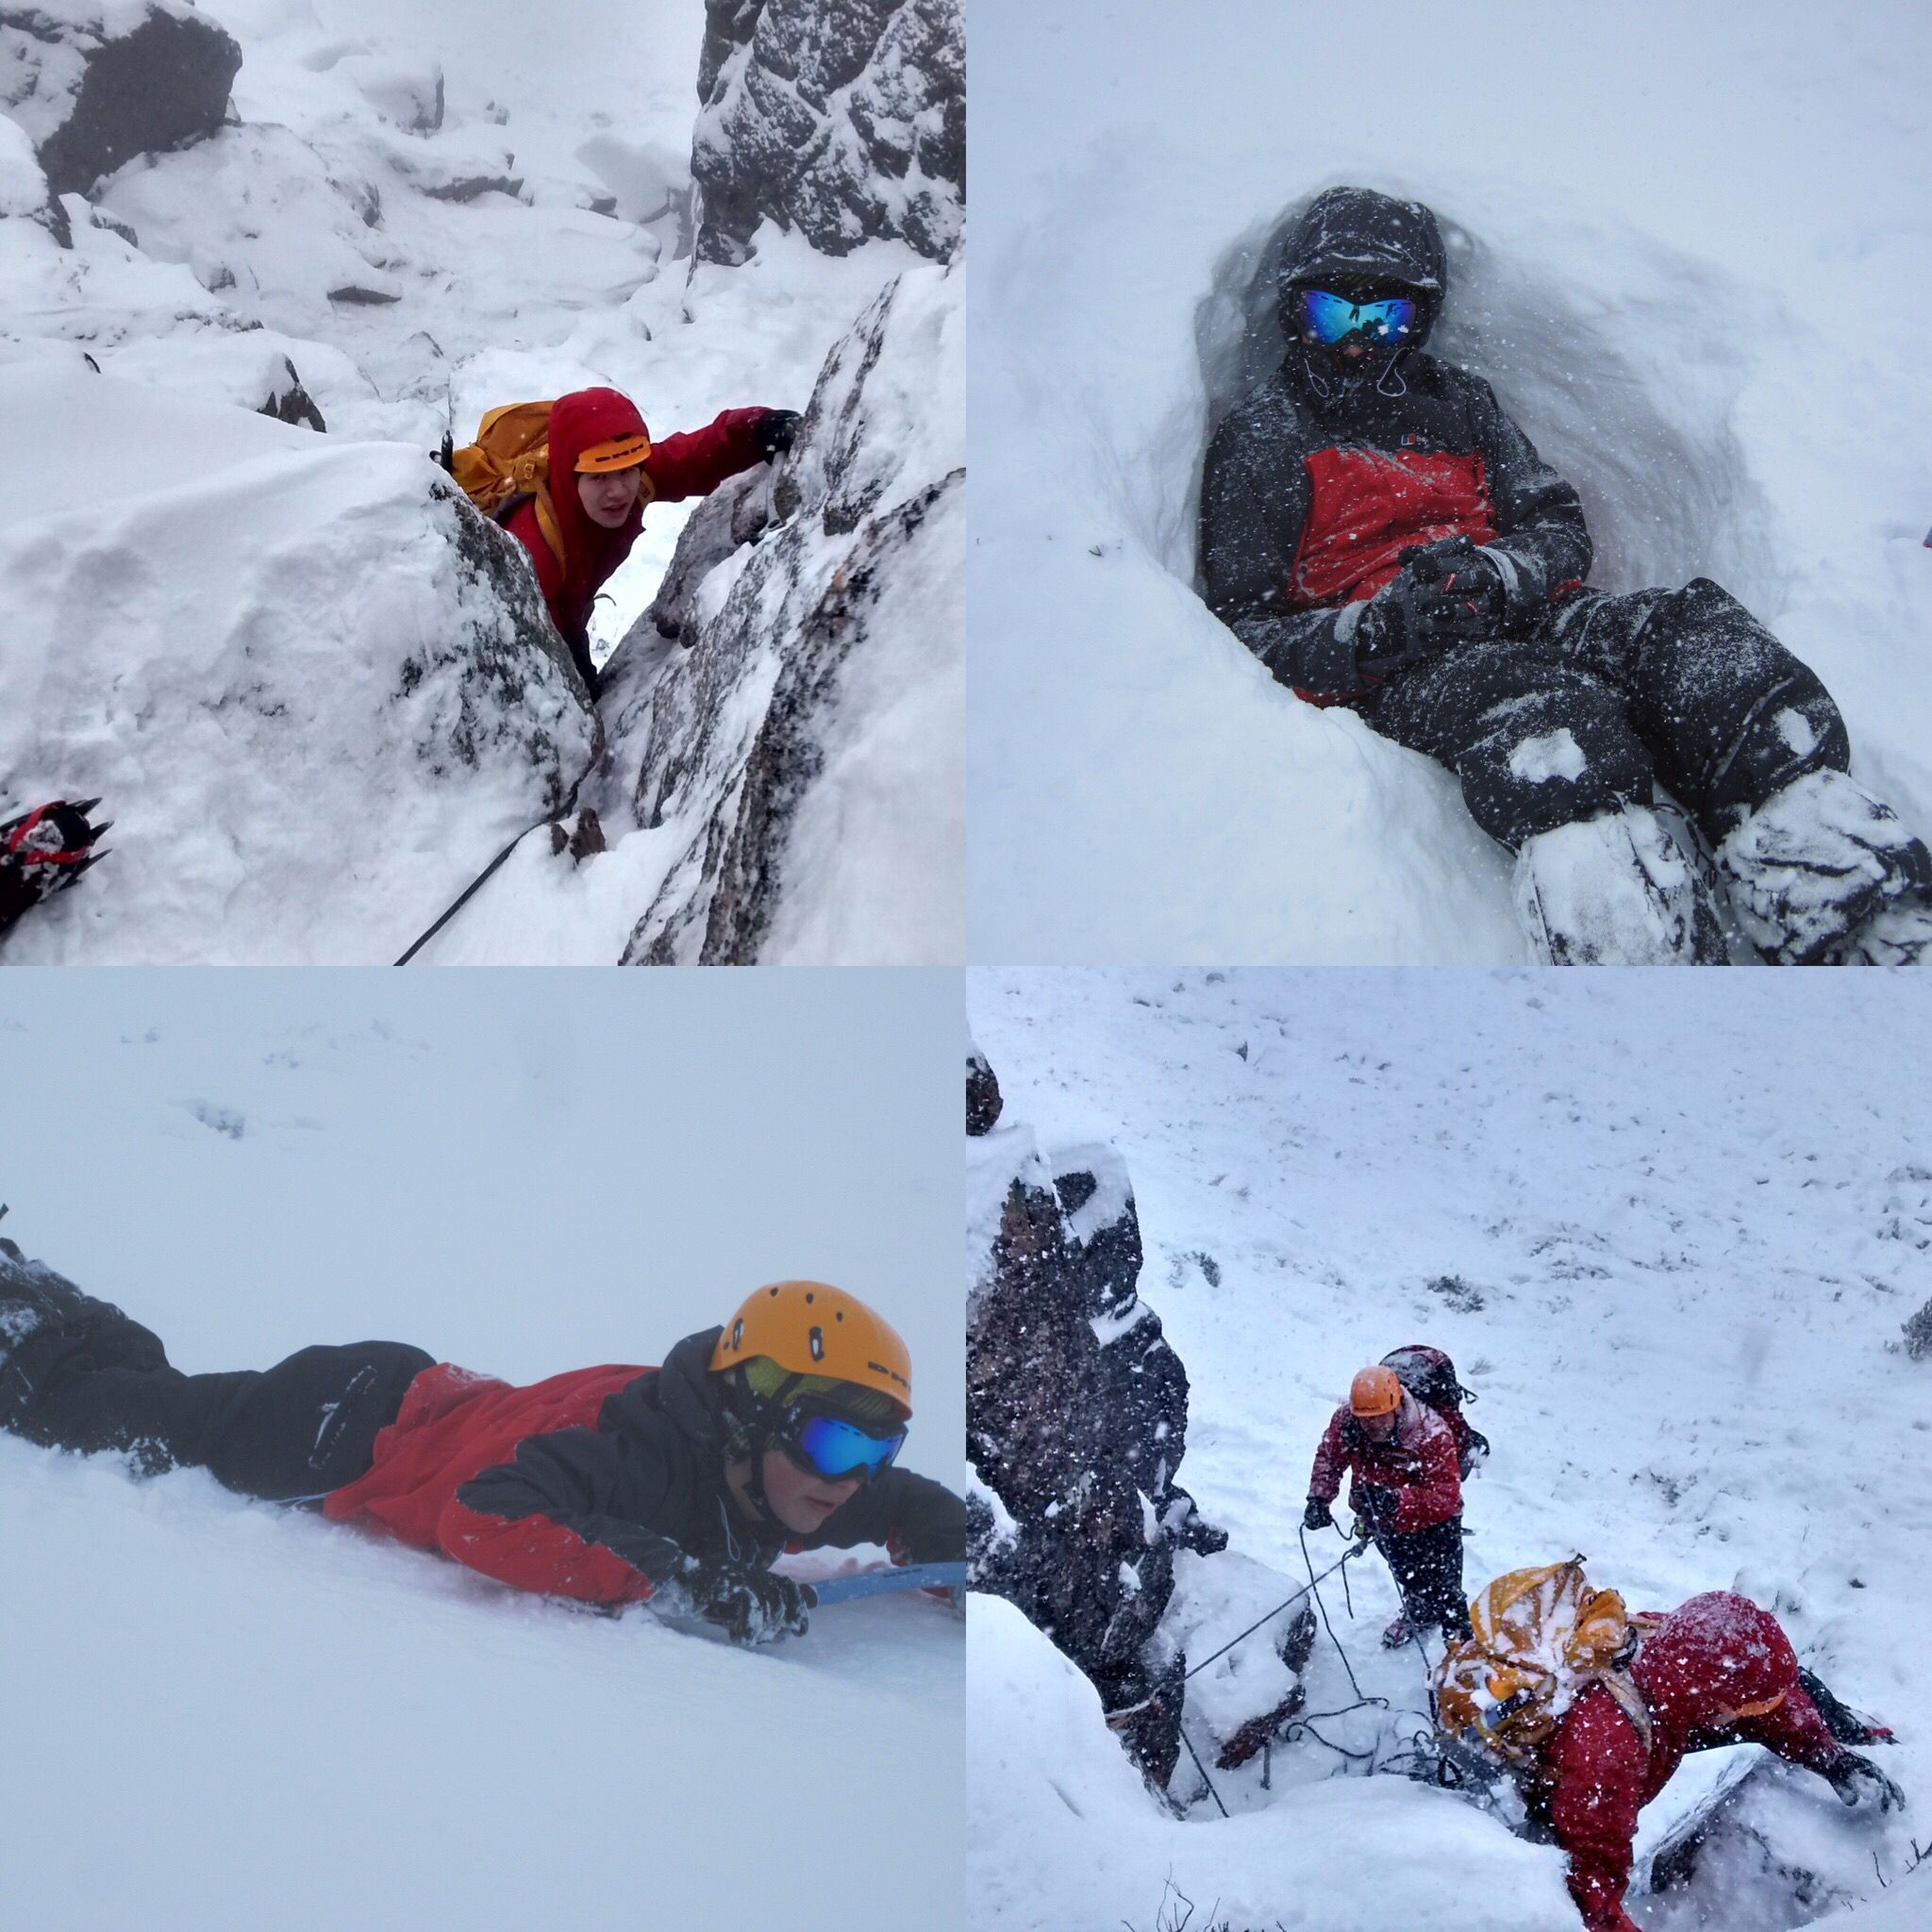 Scottish Winter Mountaineering at the Cairngorms #abbotsholmeschool #mountaineering #winter #snow #cairngorms